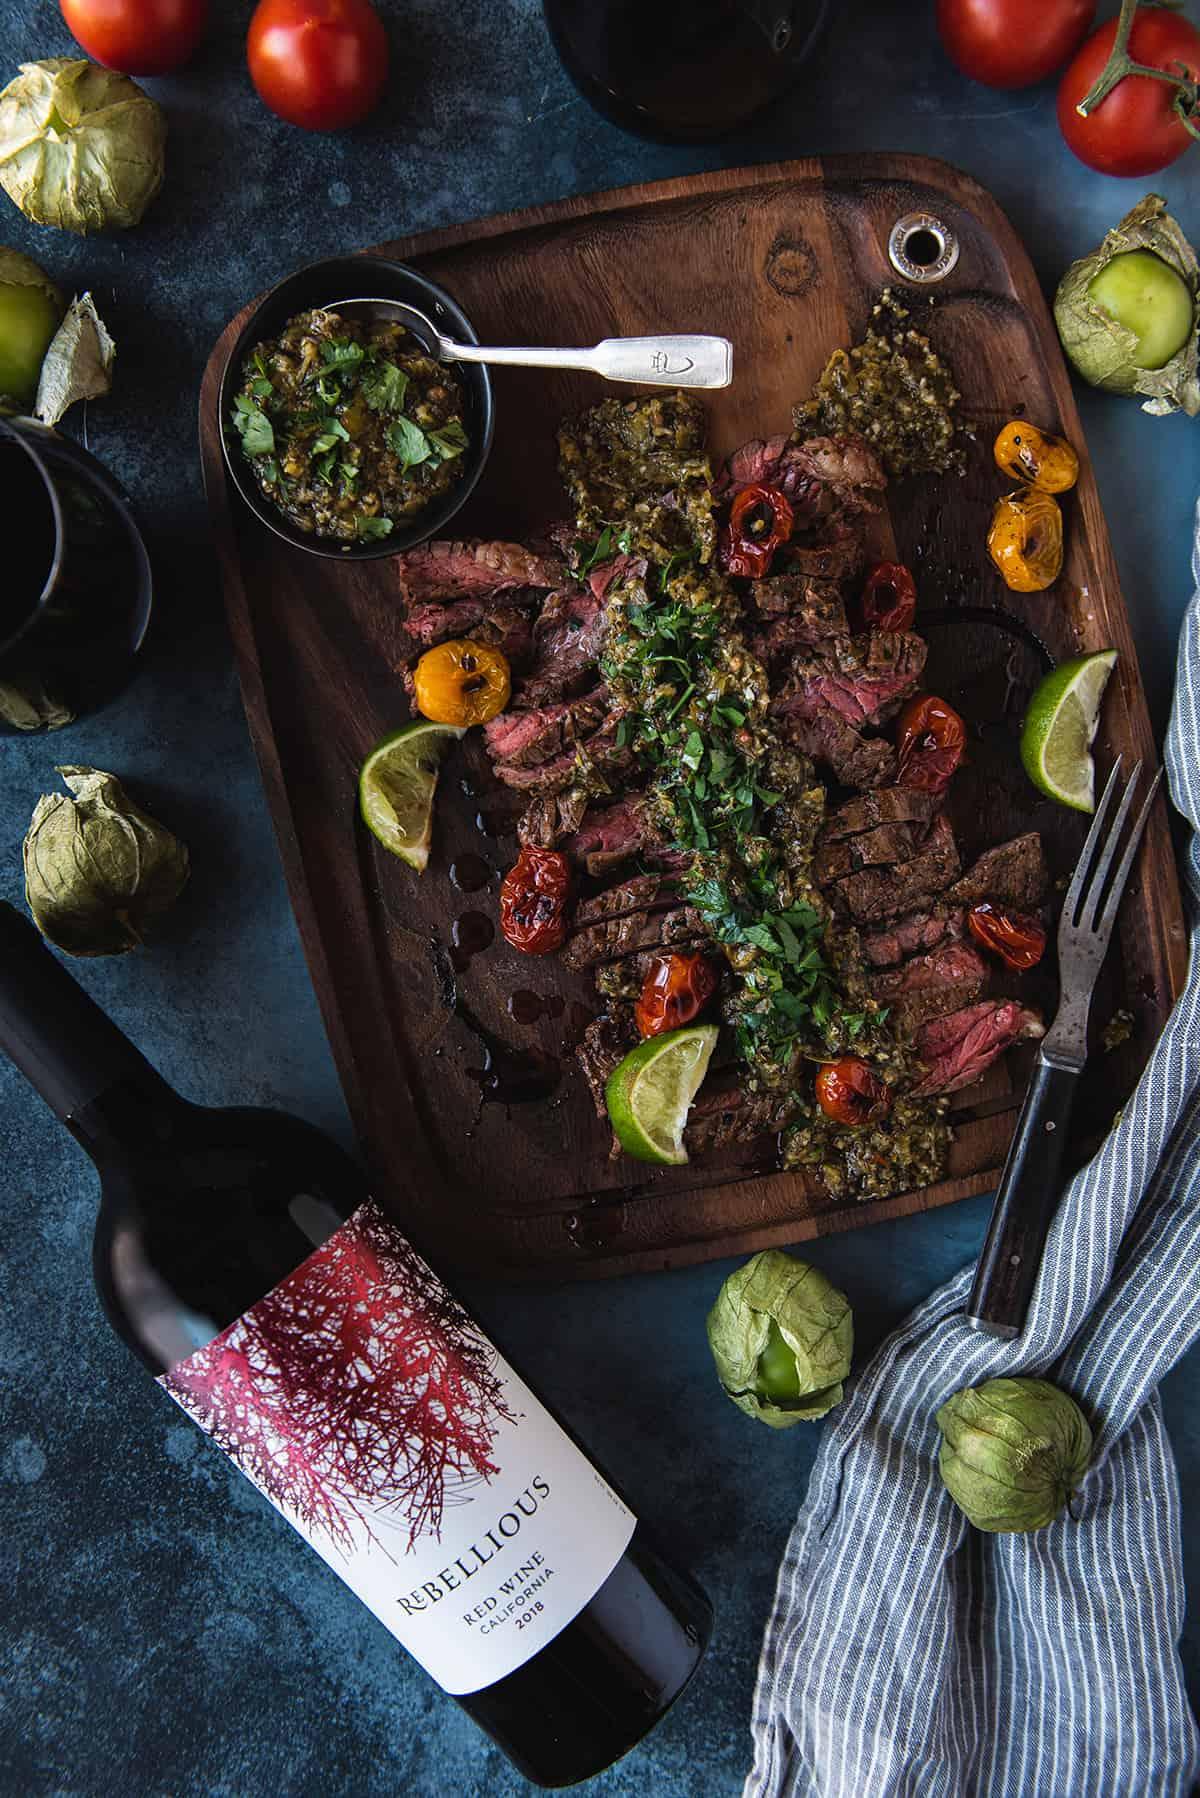 skirt steak on wood platter, chimichurri on top with rebellious wine